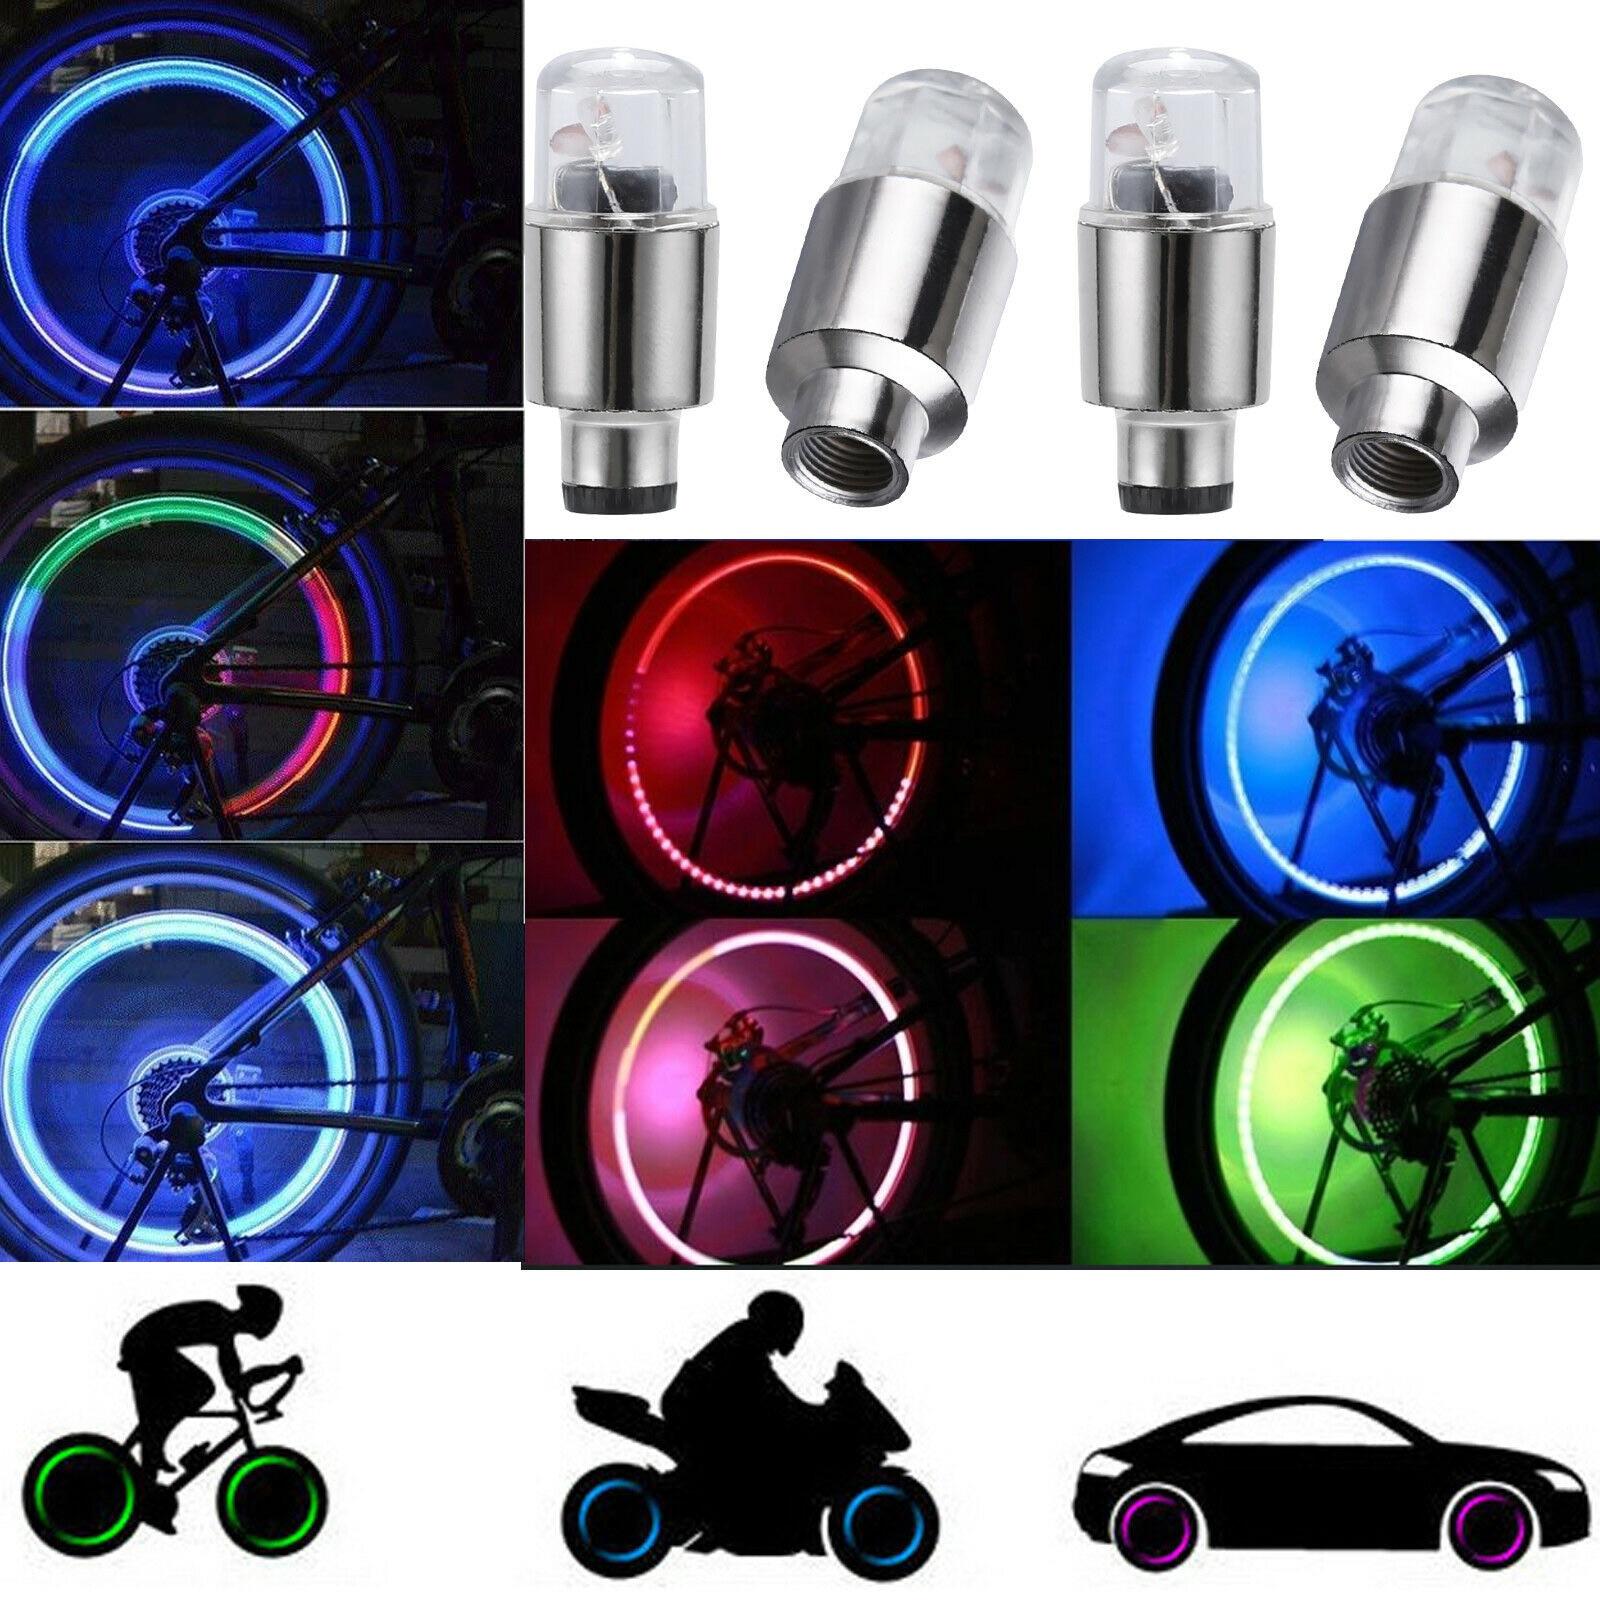 10x LED Car Bike Wheel Tire Tyre Valve Dust Cap Spoke Flash Lights Car Valve Stems Caps Accessories 4 Color Red Blue Green Lamp